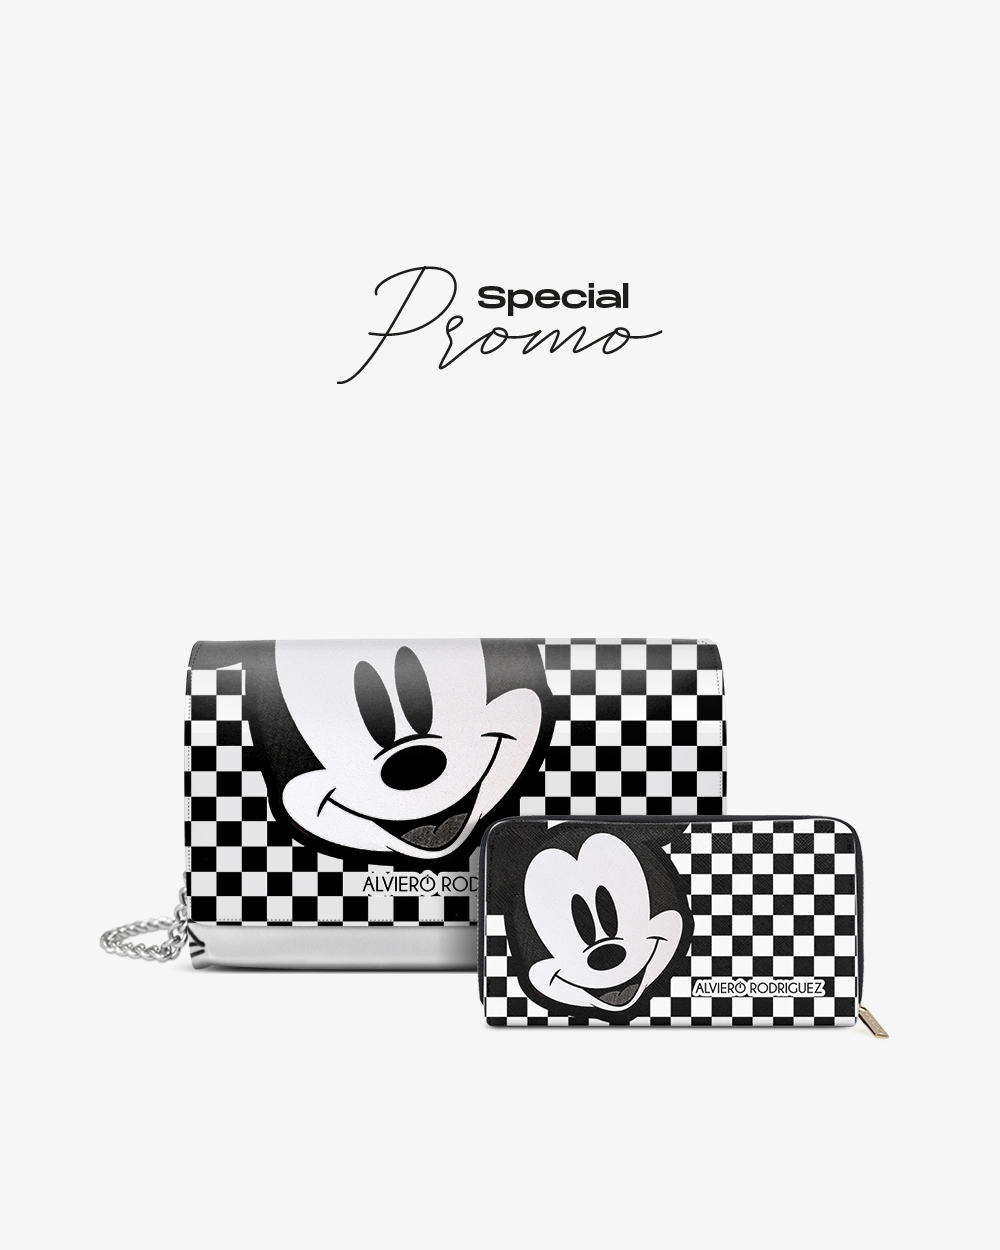 Promo Day